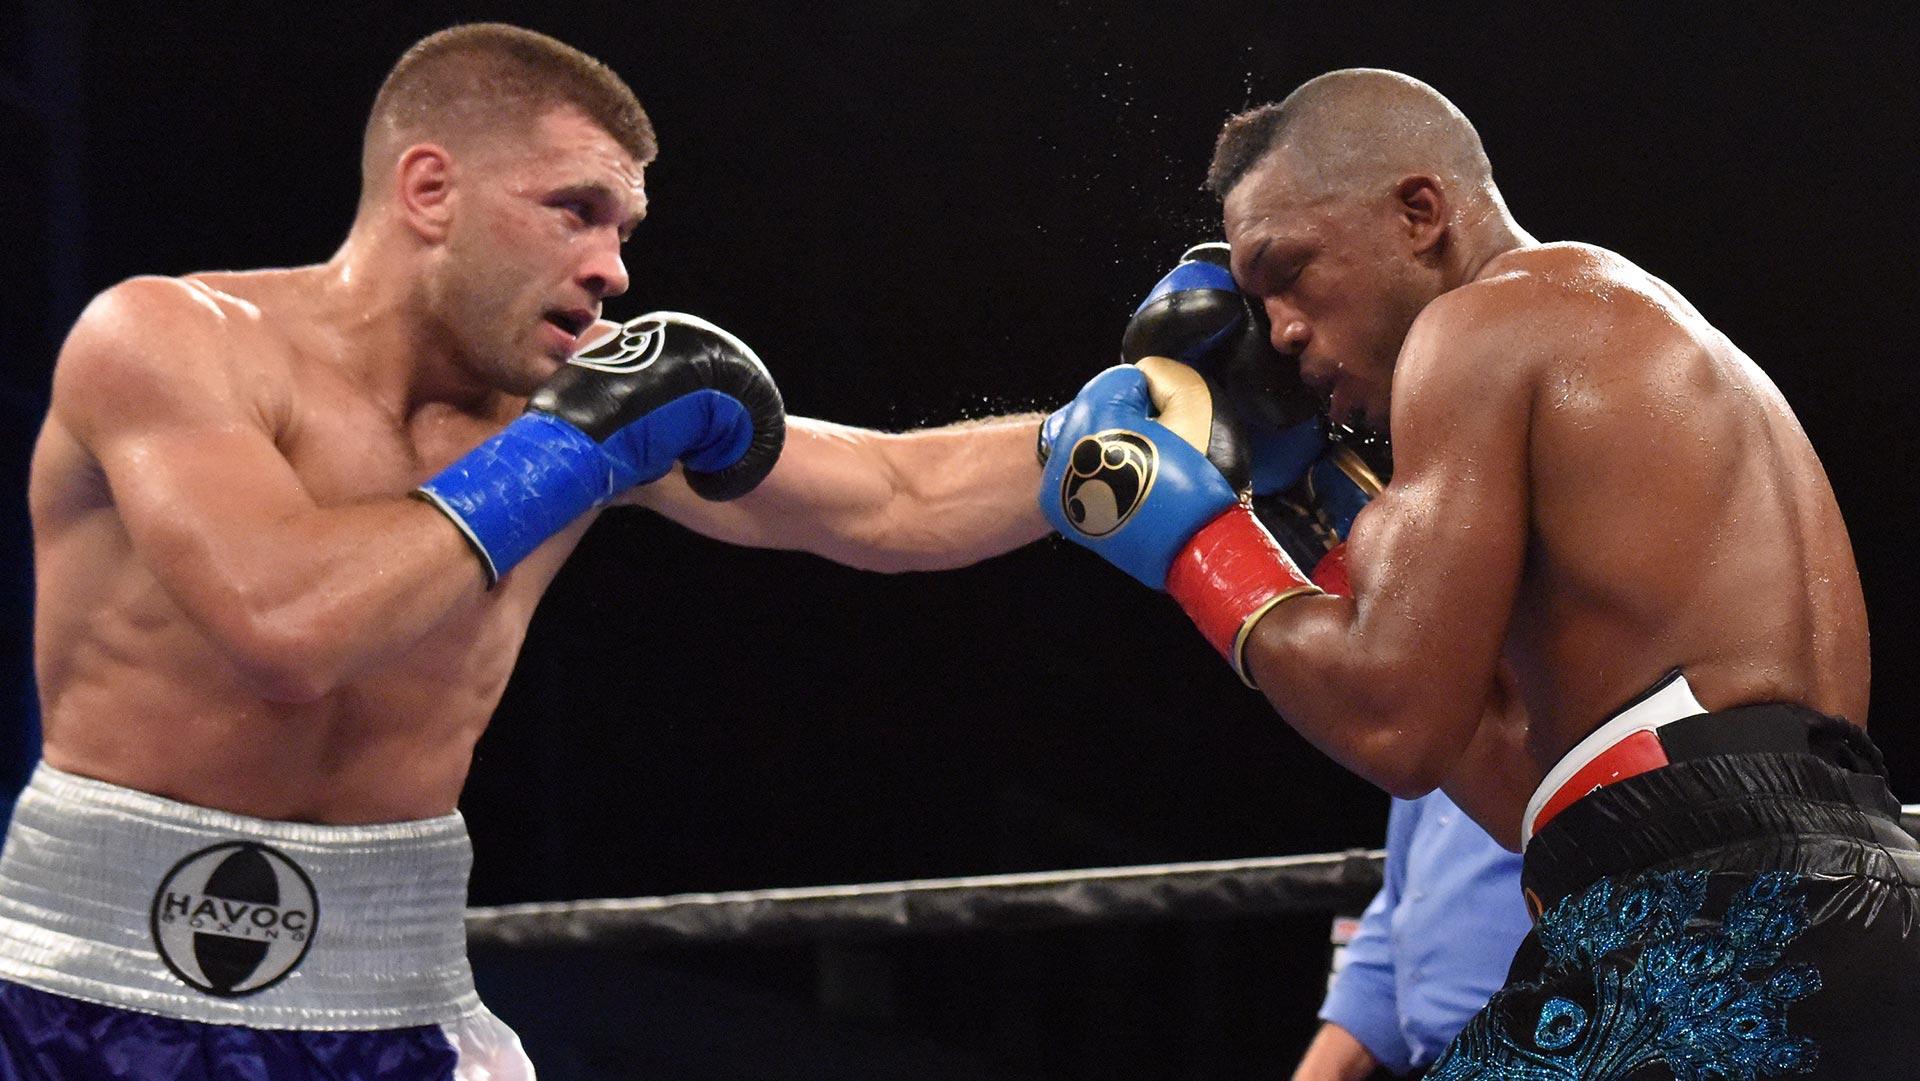 derevyanchenko vs johnson full fight august 25 2017 pbc on fs1